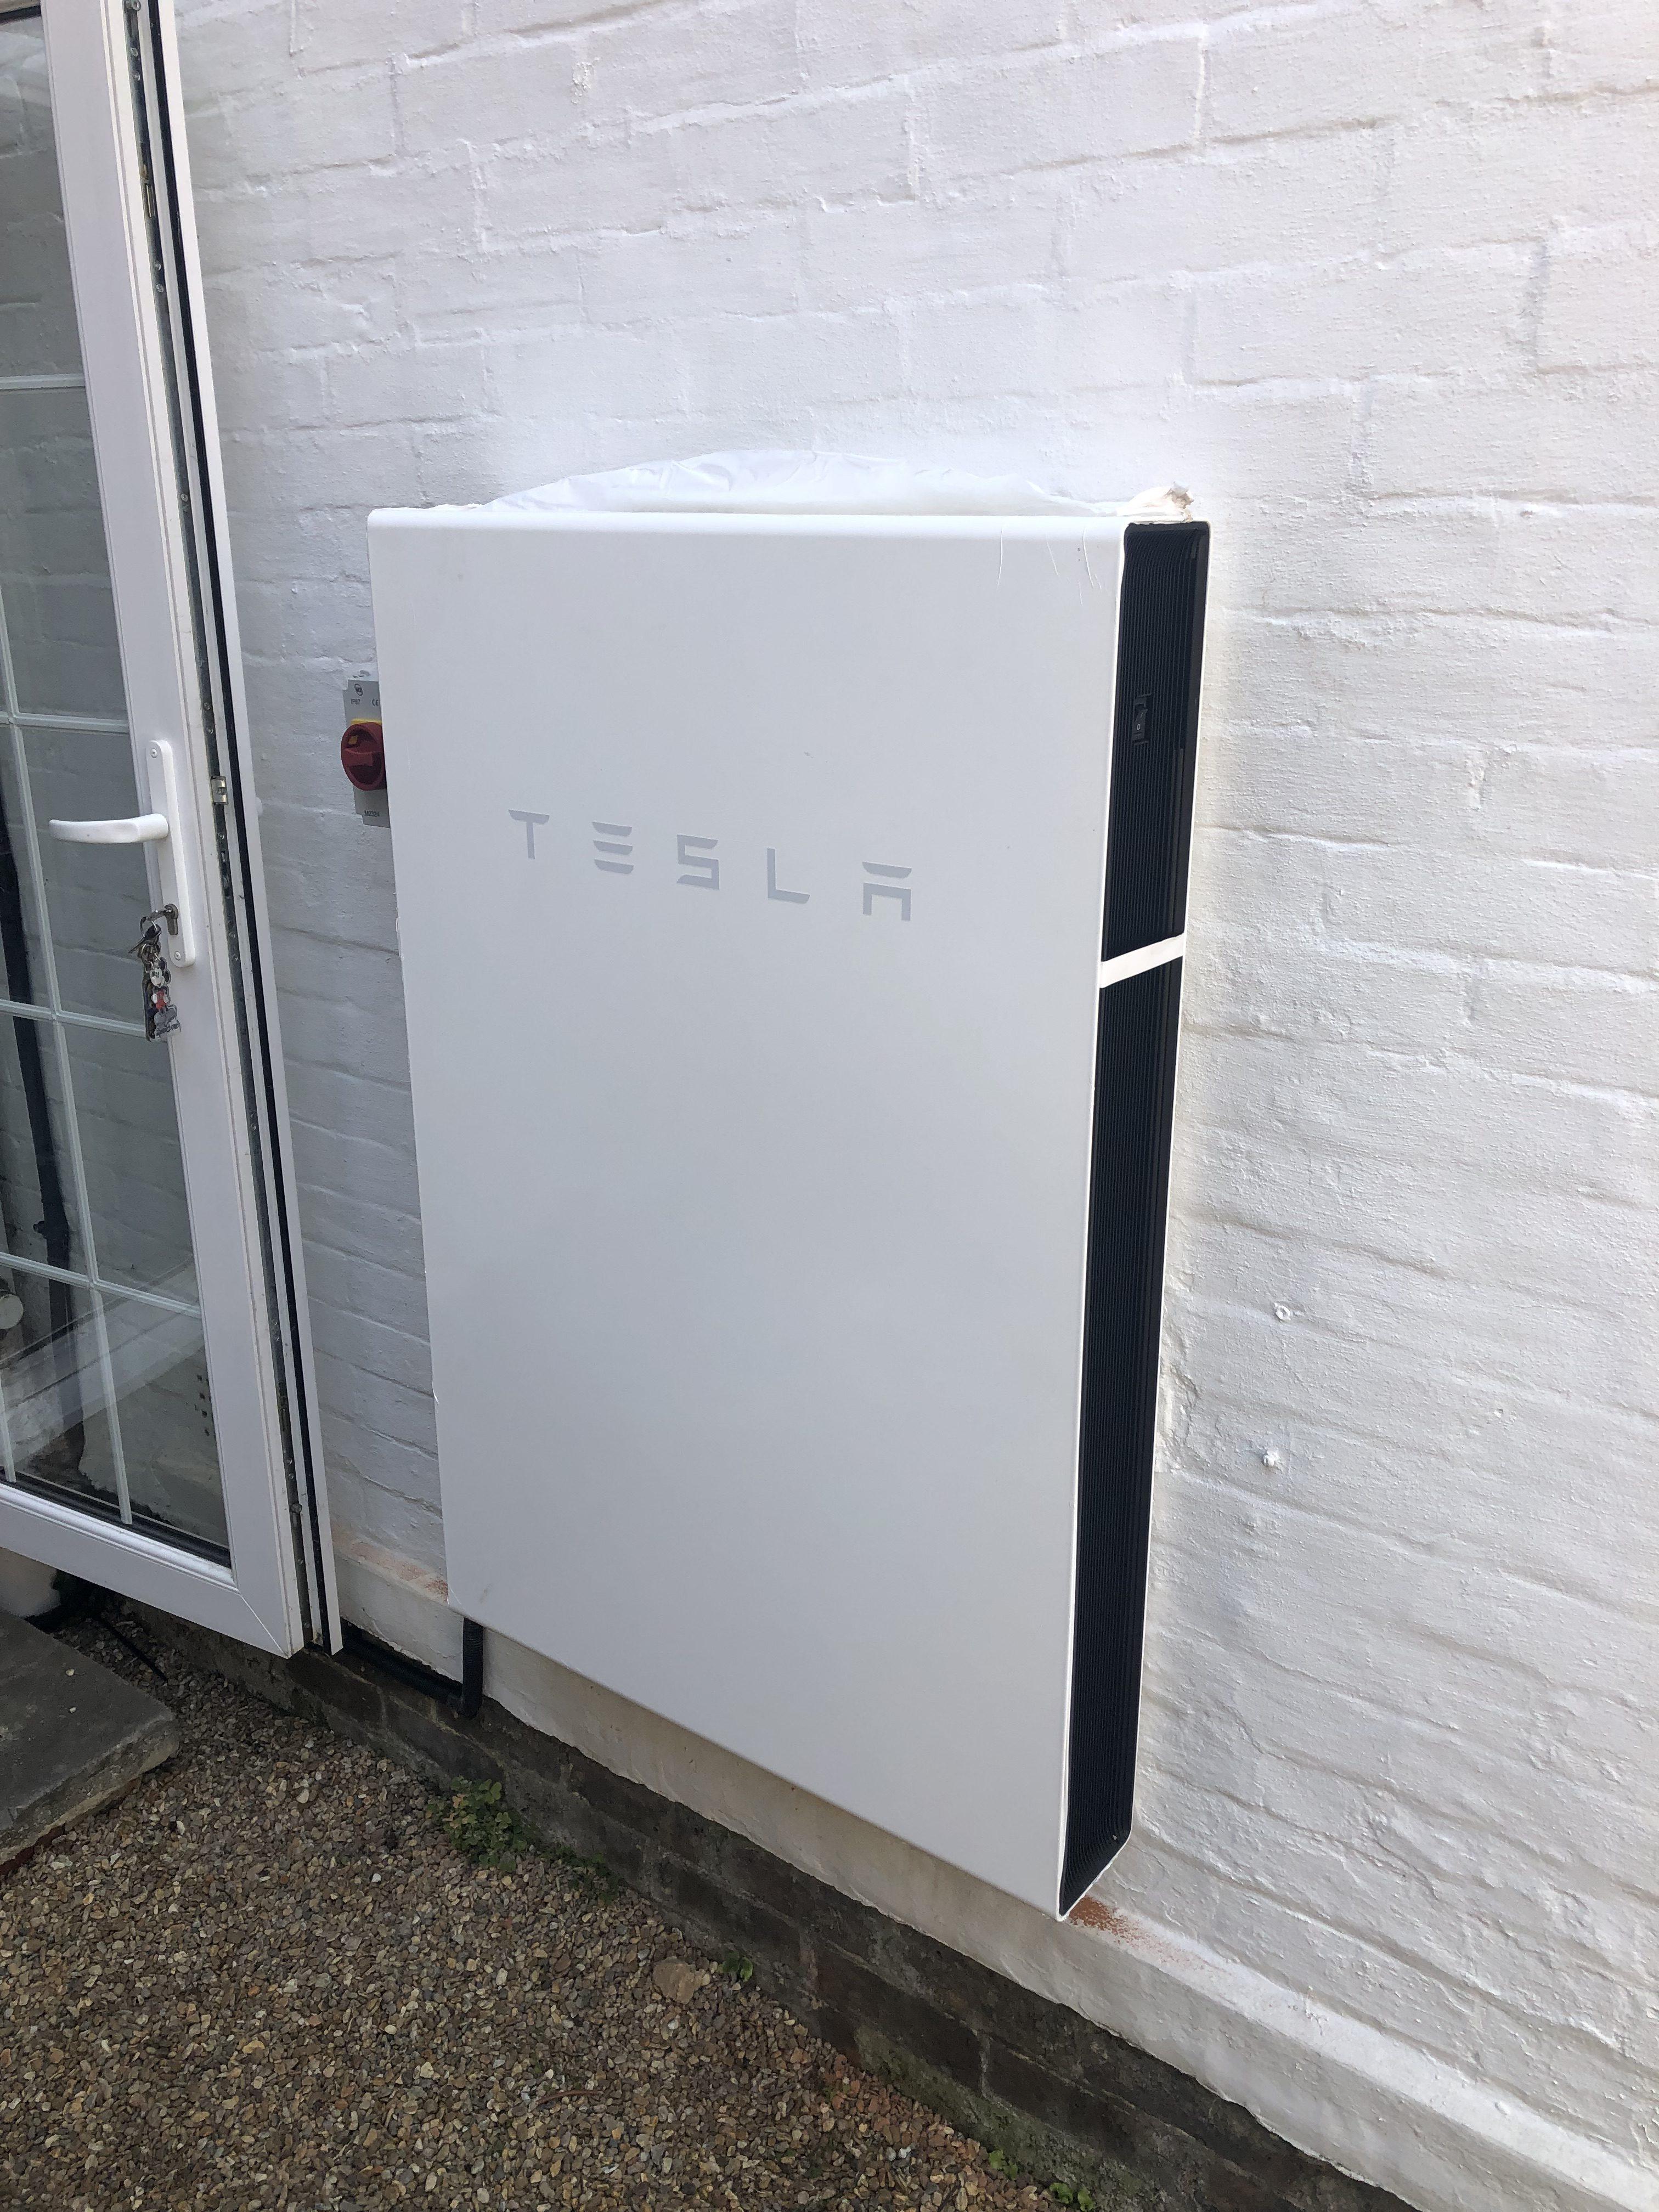 Tesla Powerwall Battery Storage: Installing now from £7800+VAT